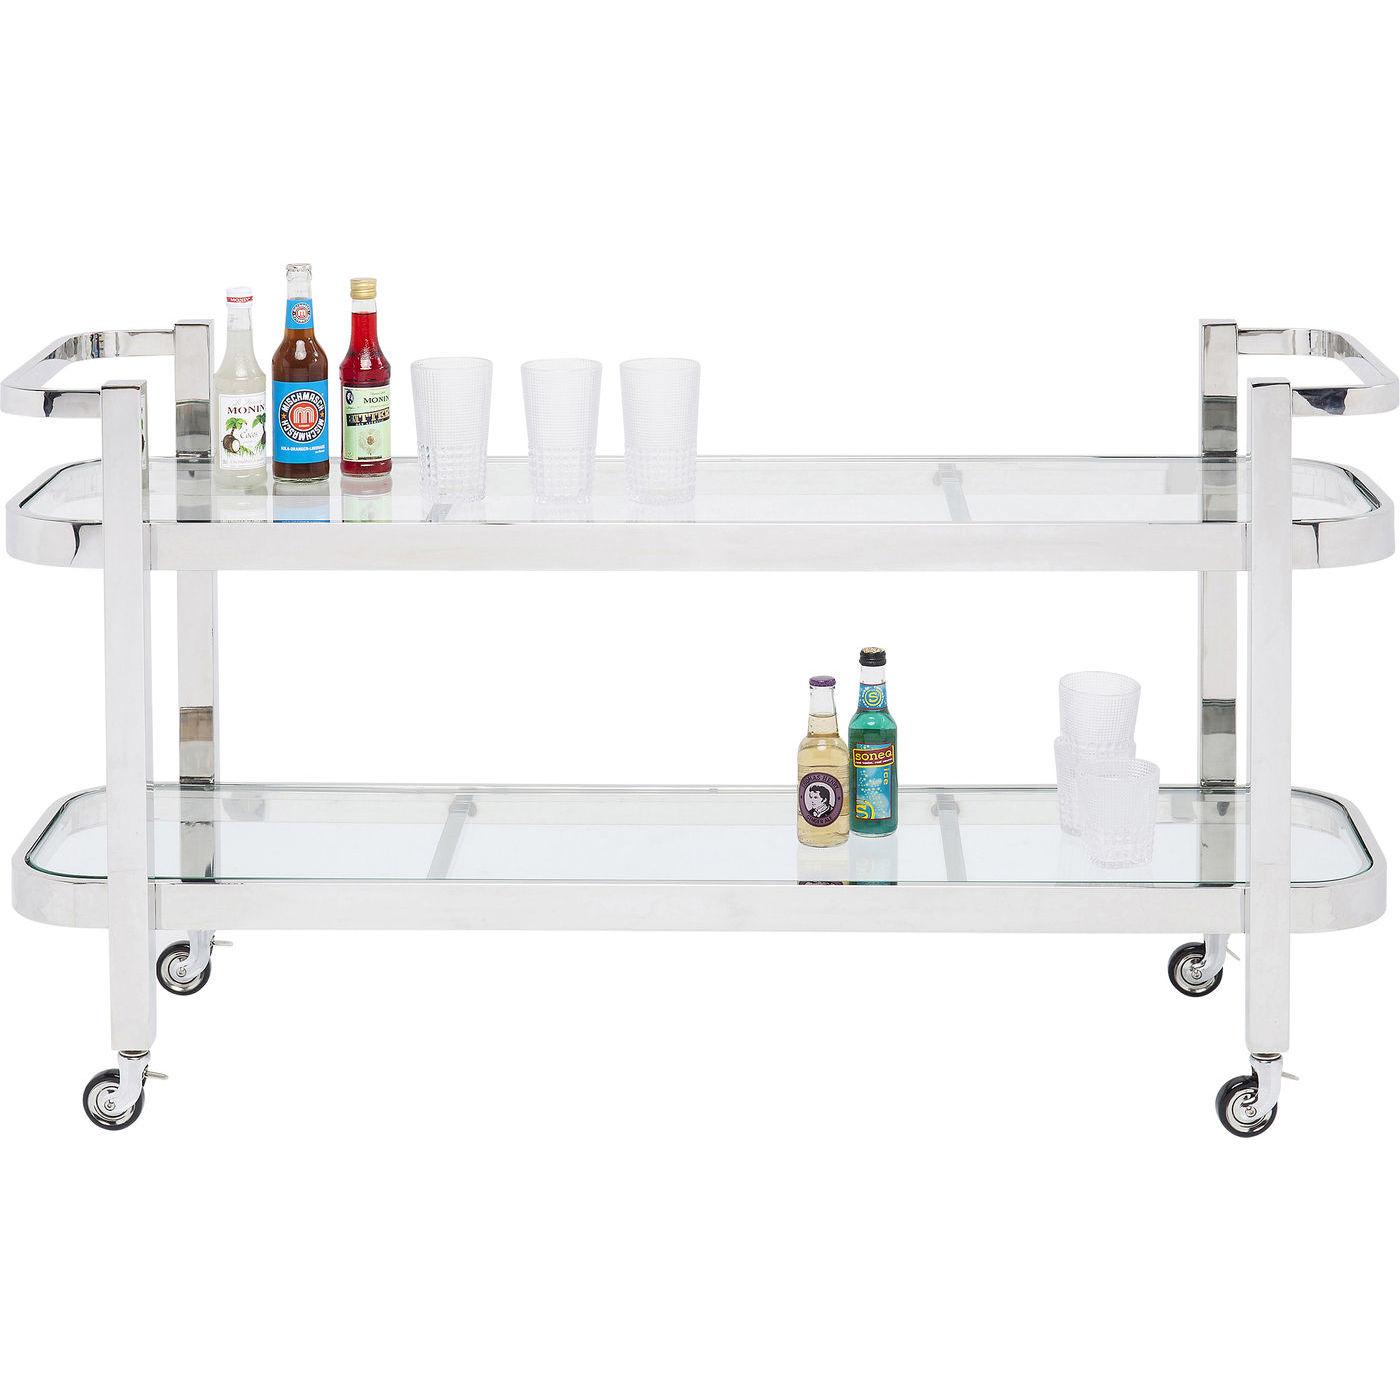 kare design Kare design daydrinking rullebord - klart glas/sølv stål, m. hylde og hjul (140x46) fra boboonline.dk